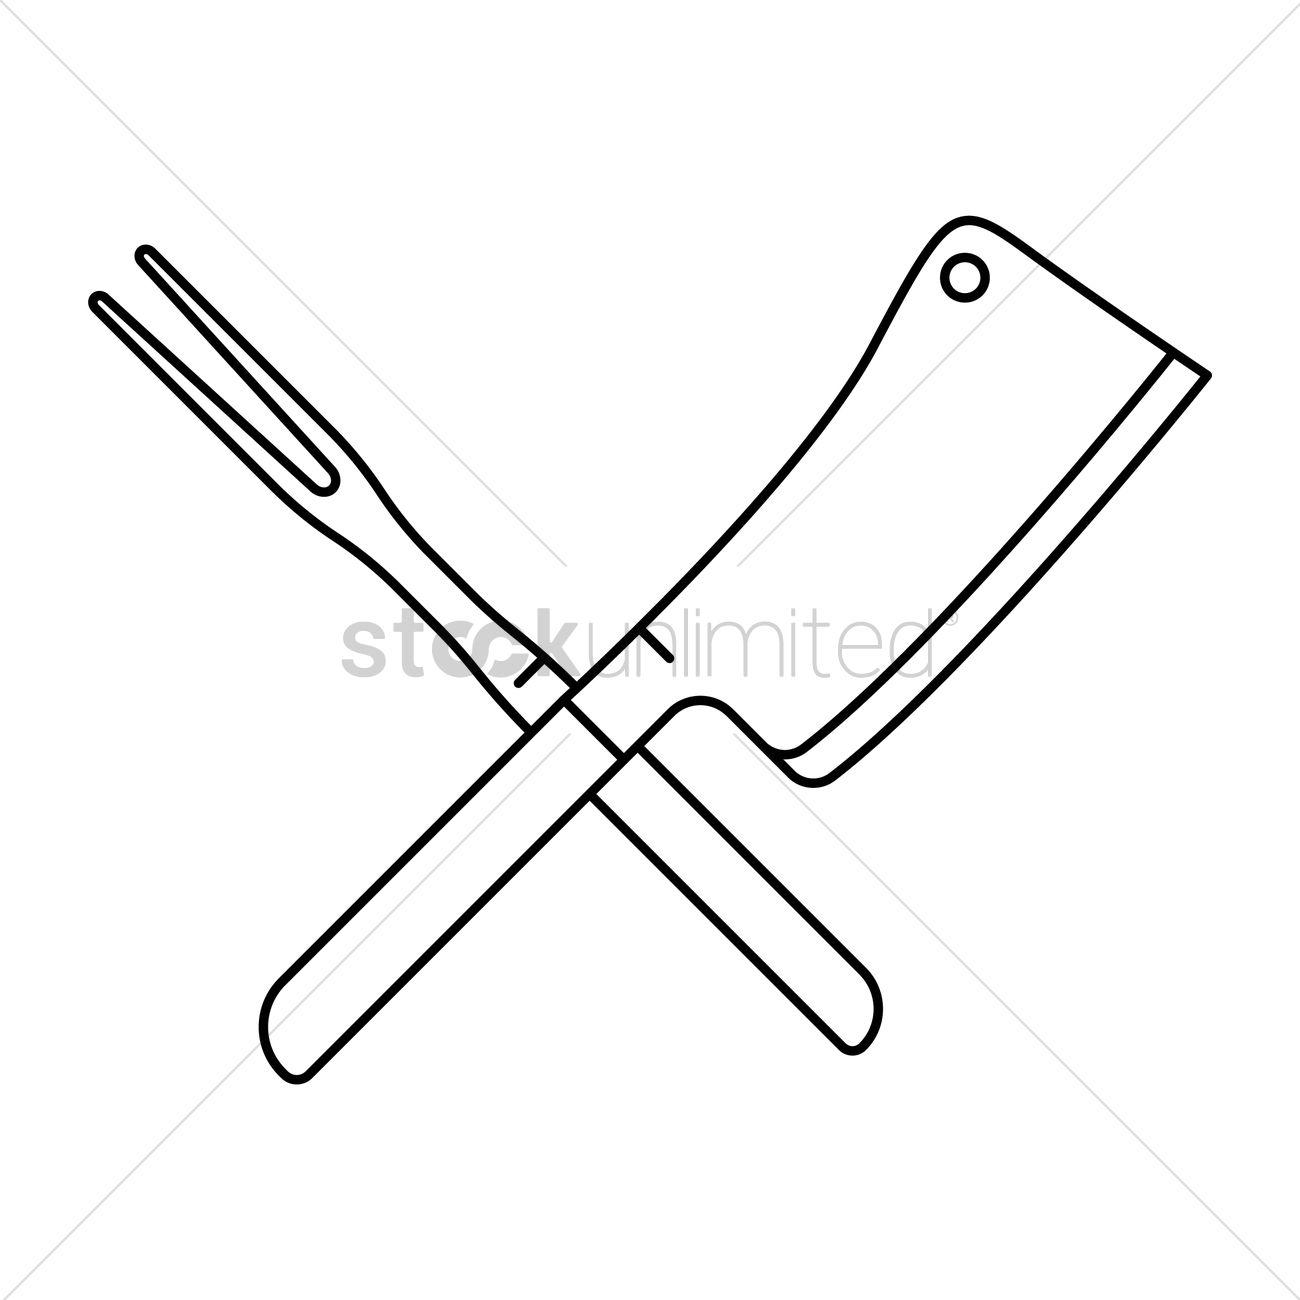 Crossed Steak Fork And Butcher Knife Vector Image